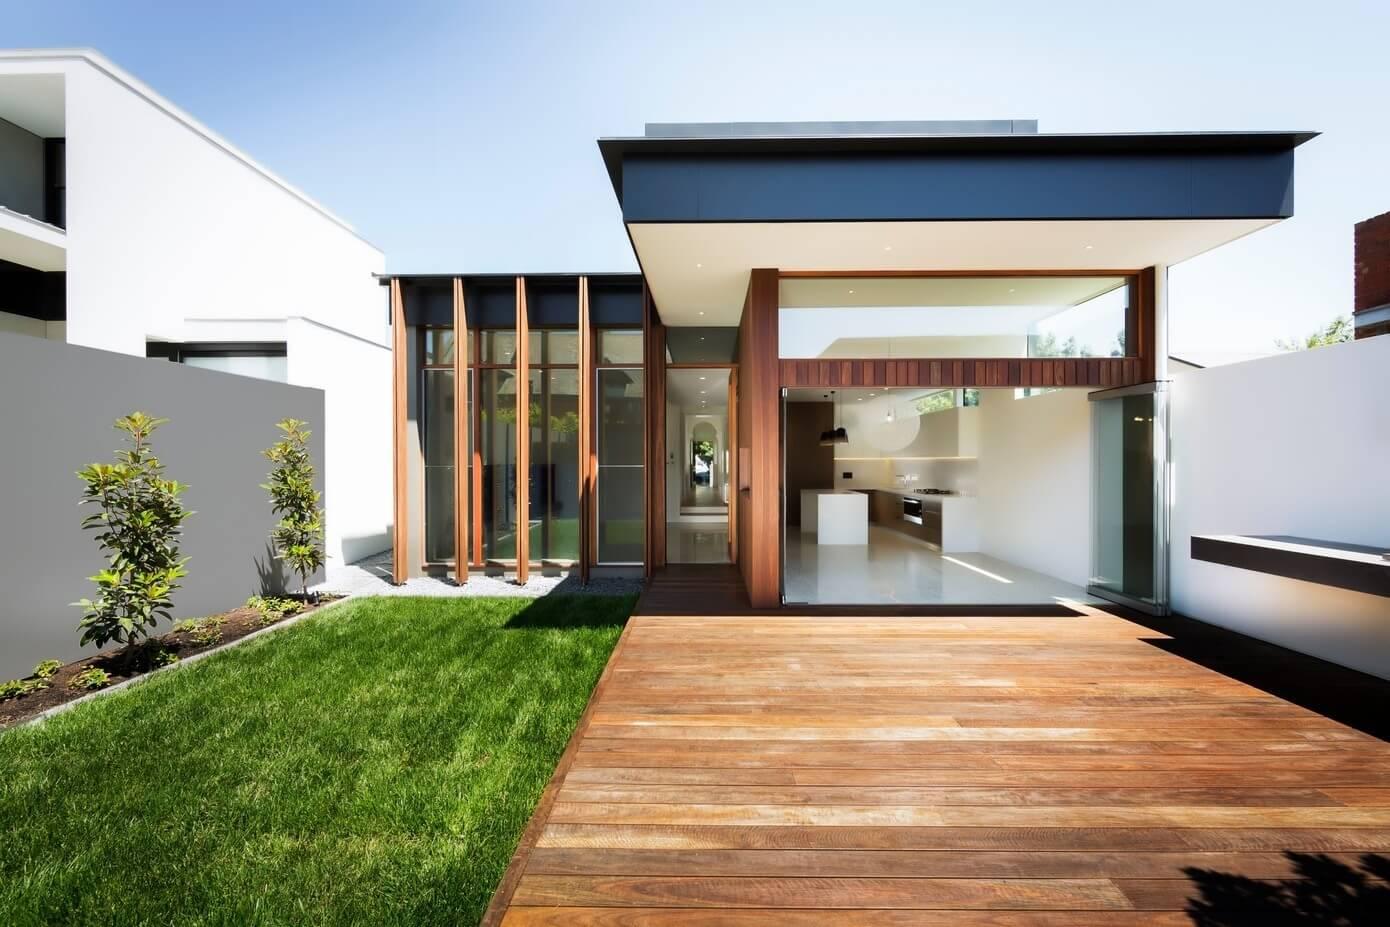 armadale-house-mitsuori-architects-02